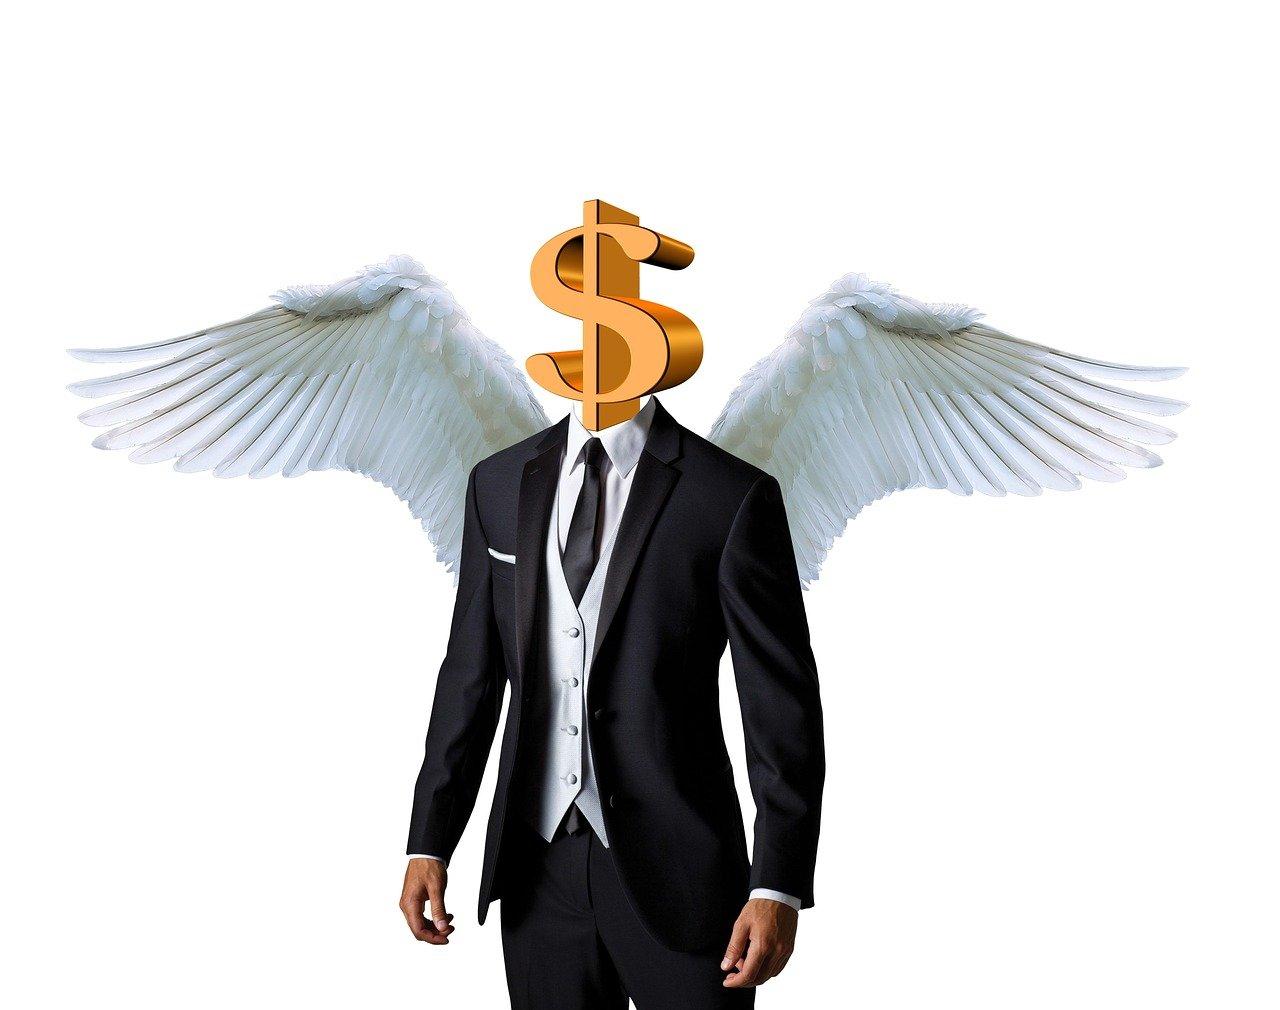 riskov-kapital